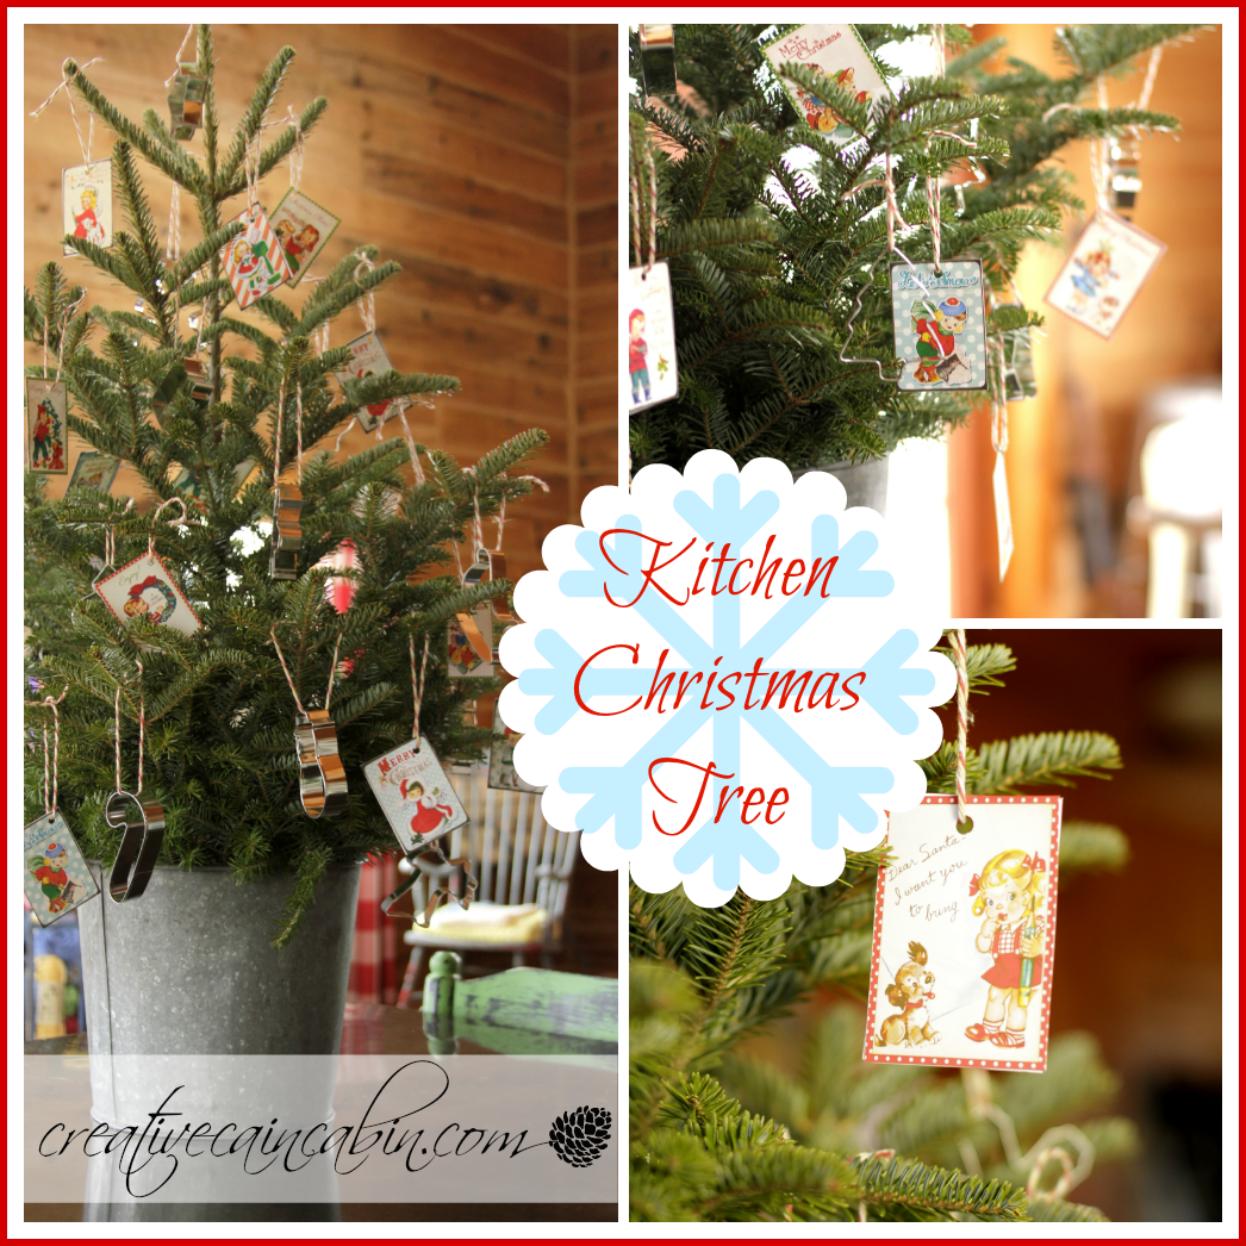 Kitchen Christmas Tree - CREATIVE CAIN CABIN